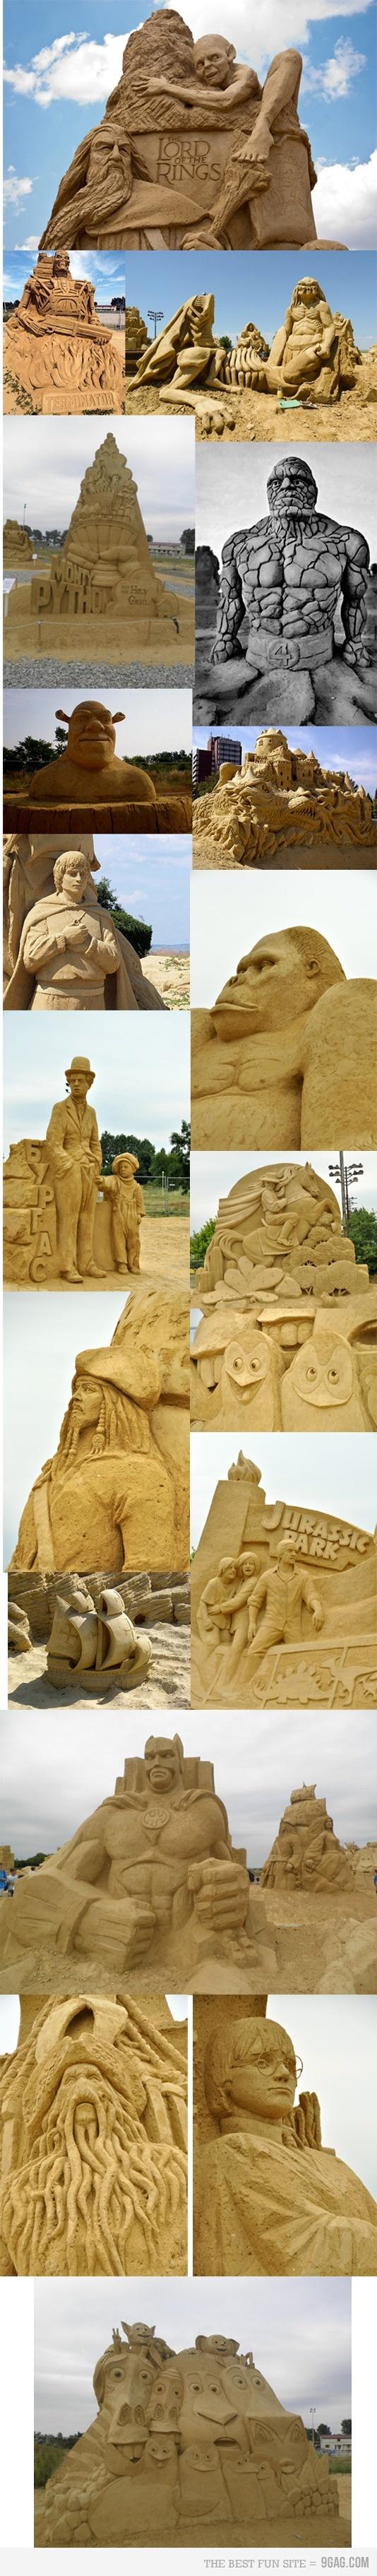 145 best Sand Sculpture Art images on Pinterest | Sand art ...